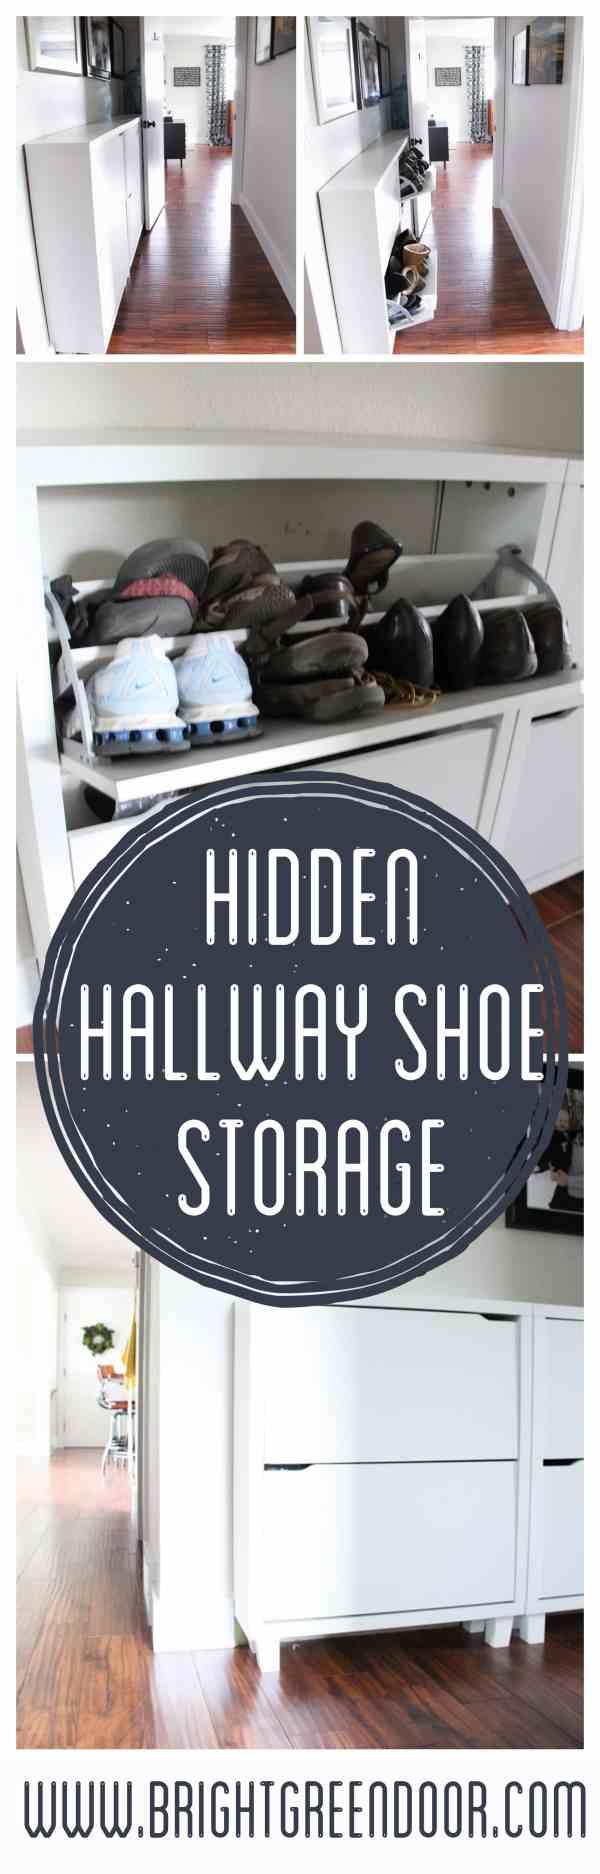 Foyer Shoe Storage Solutions : Hallway shoe storage solution bright green door